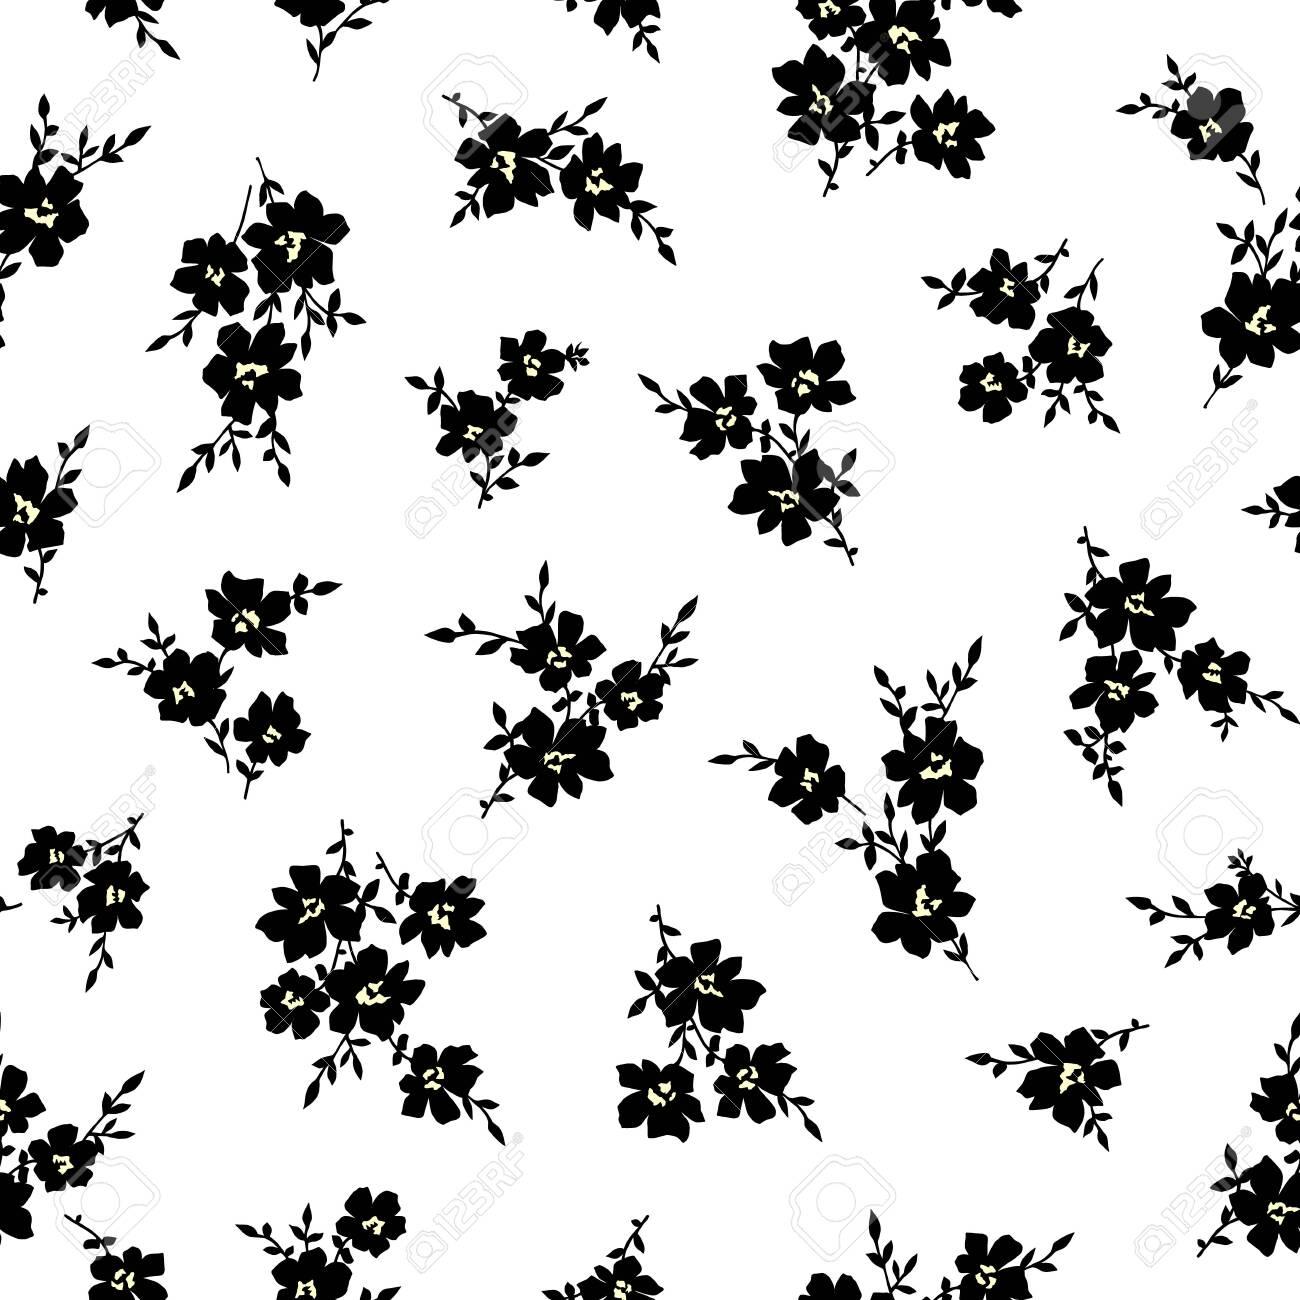 Seamless vector pattern of a beautiful flower, - 127806230